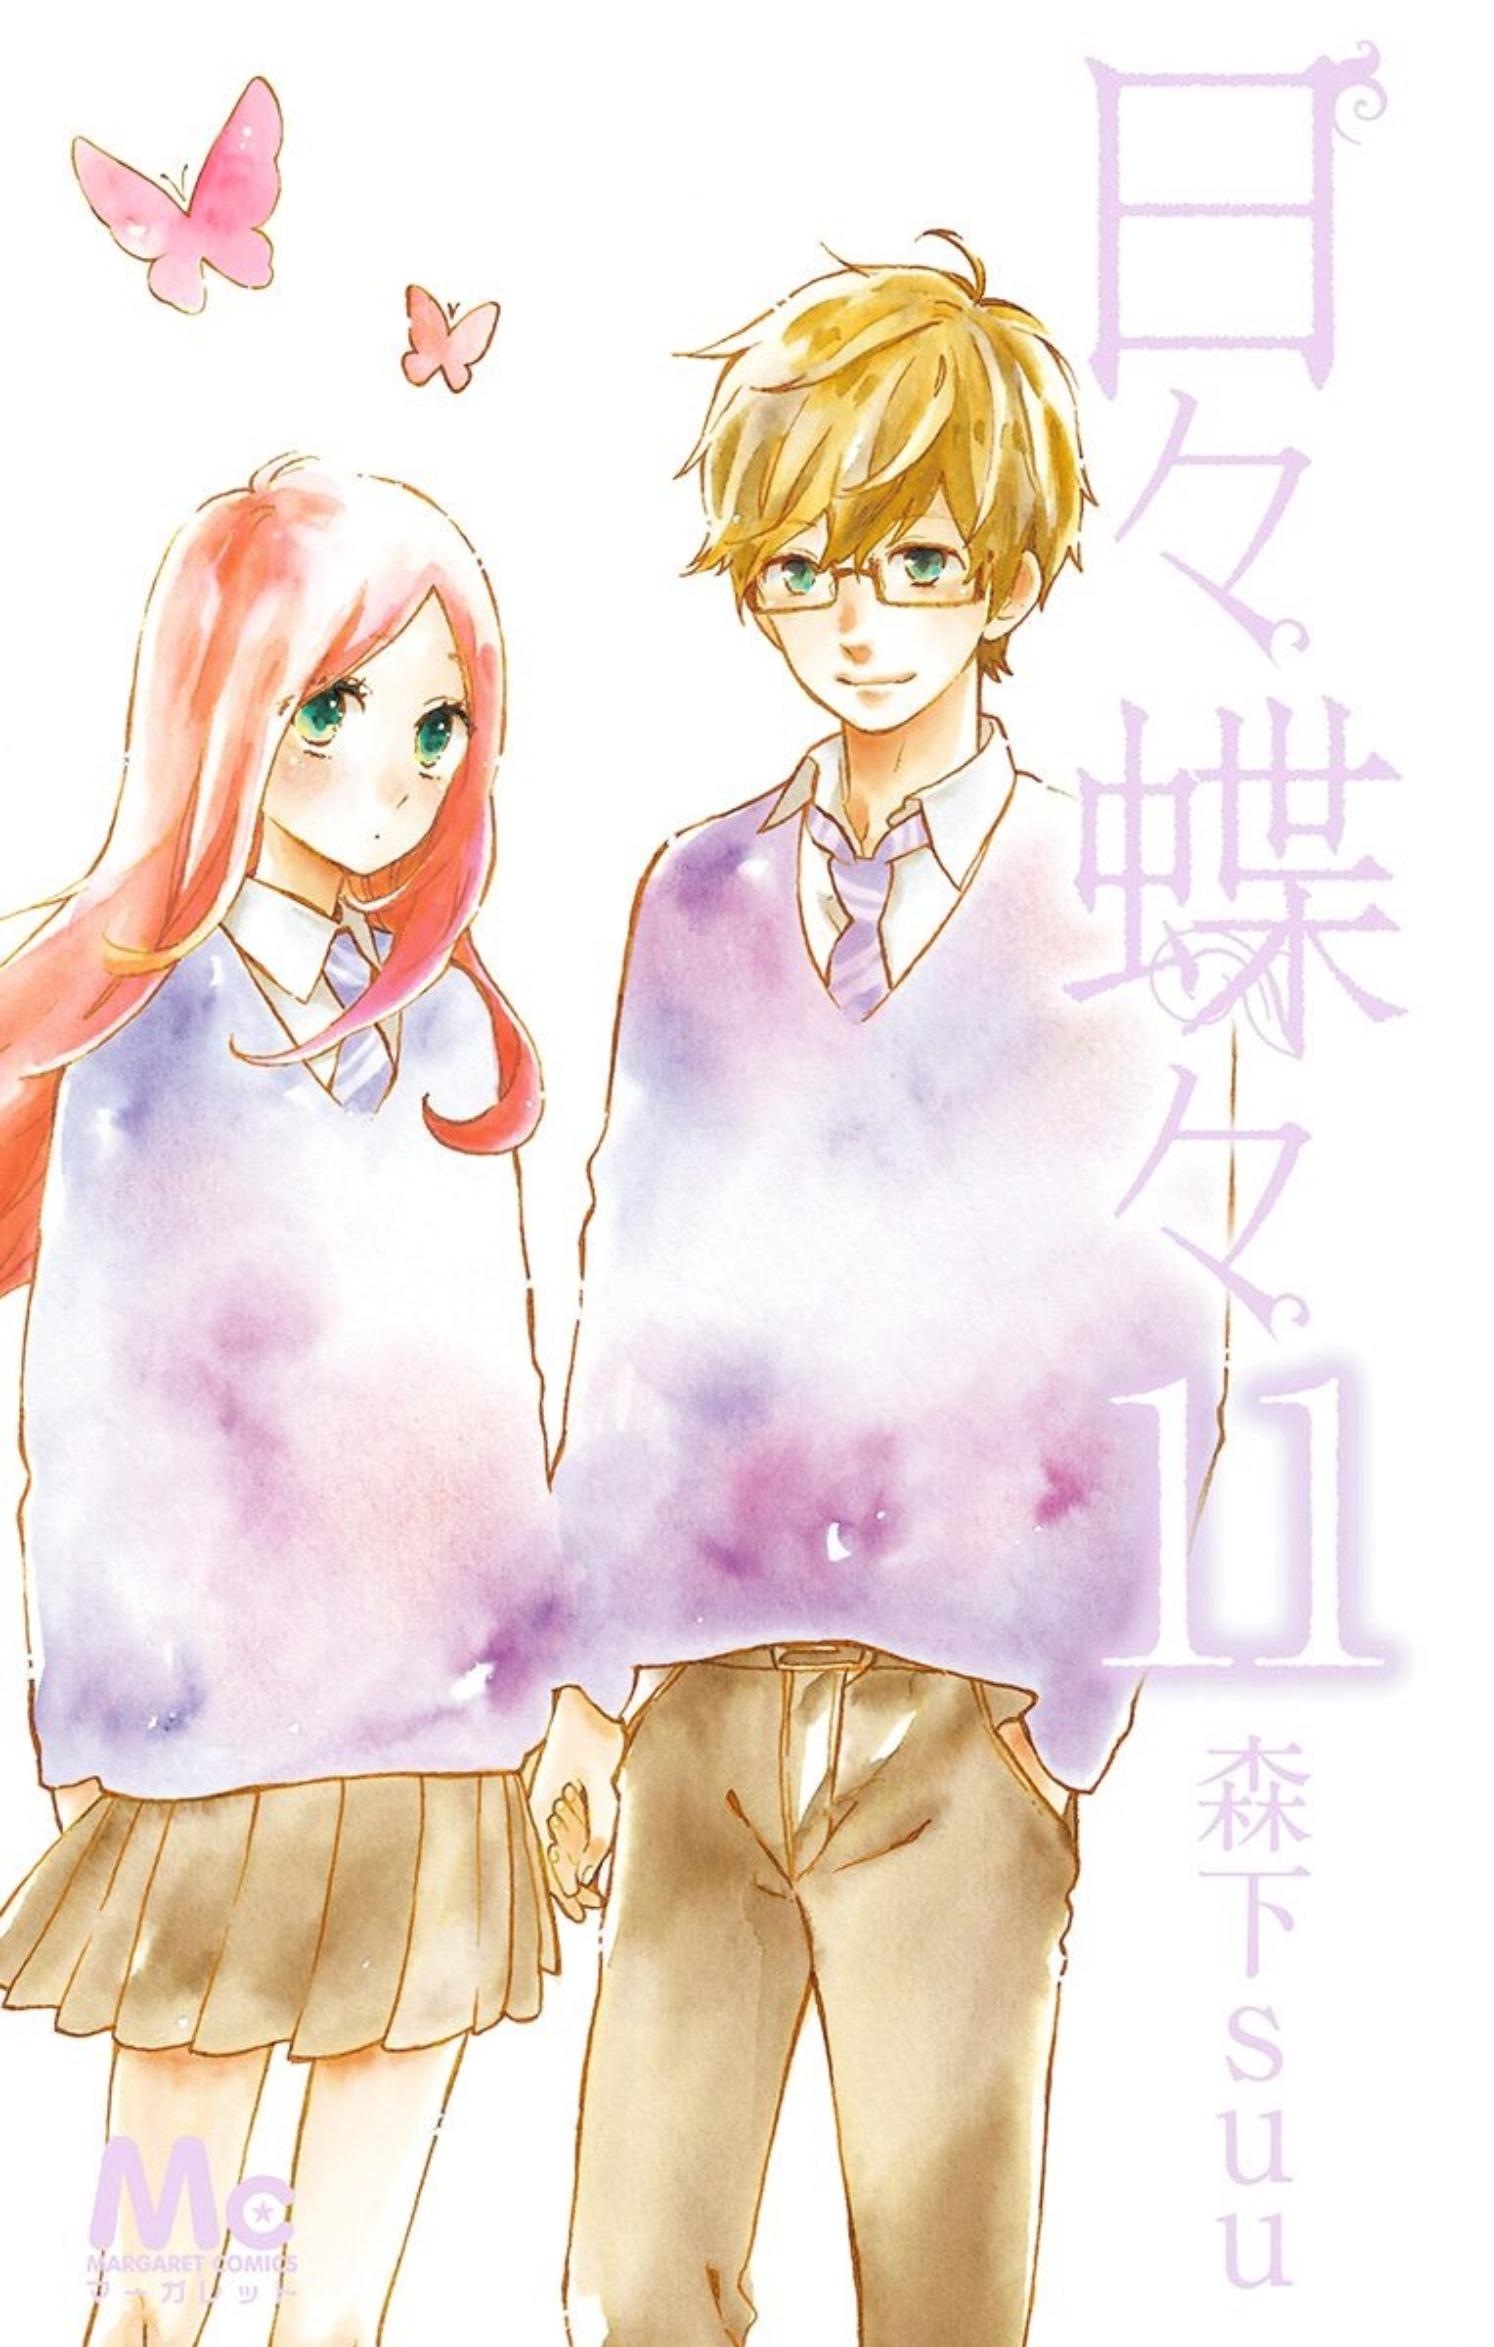 Cover Volume 11